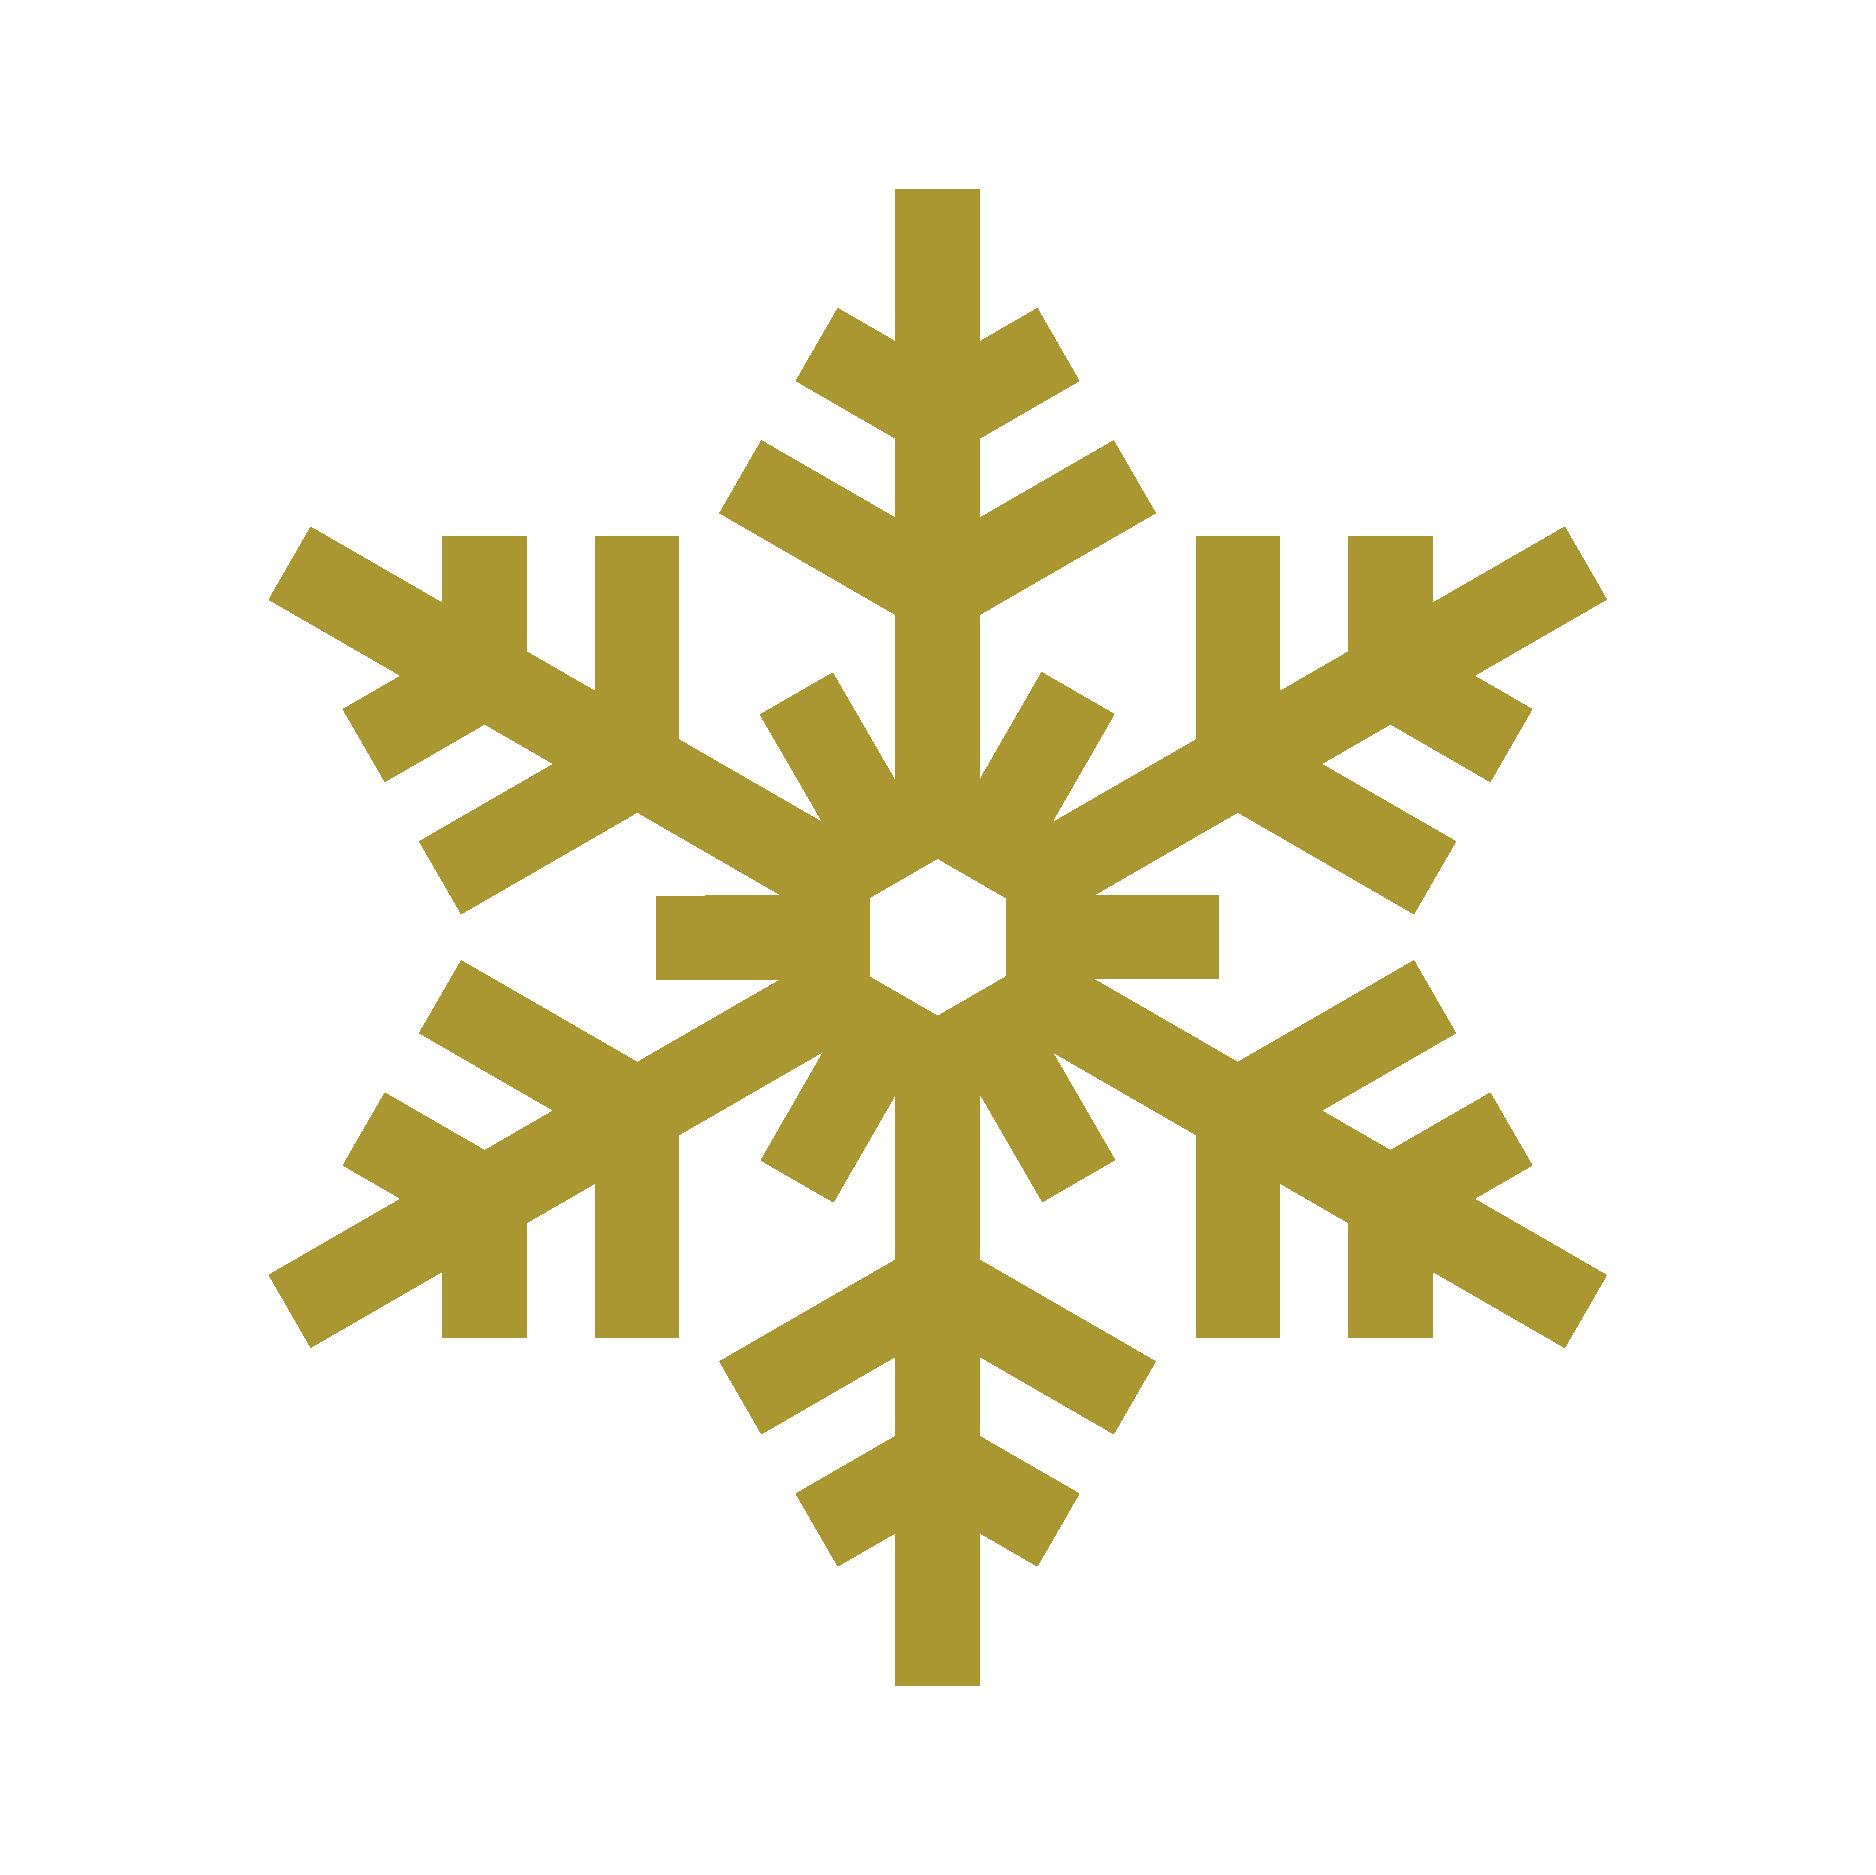 SLI_FOT_WebAssets_Snowflake 3